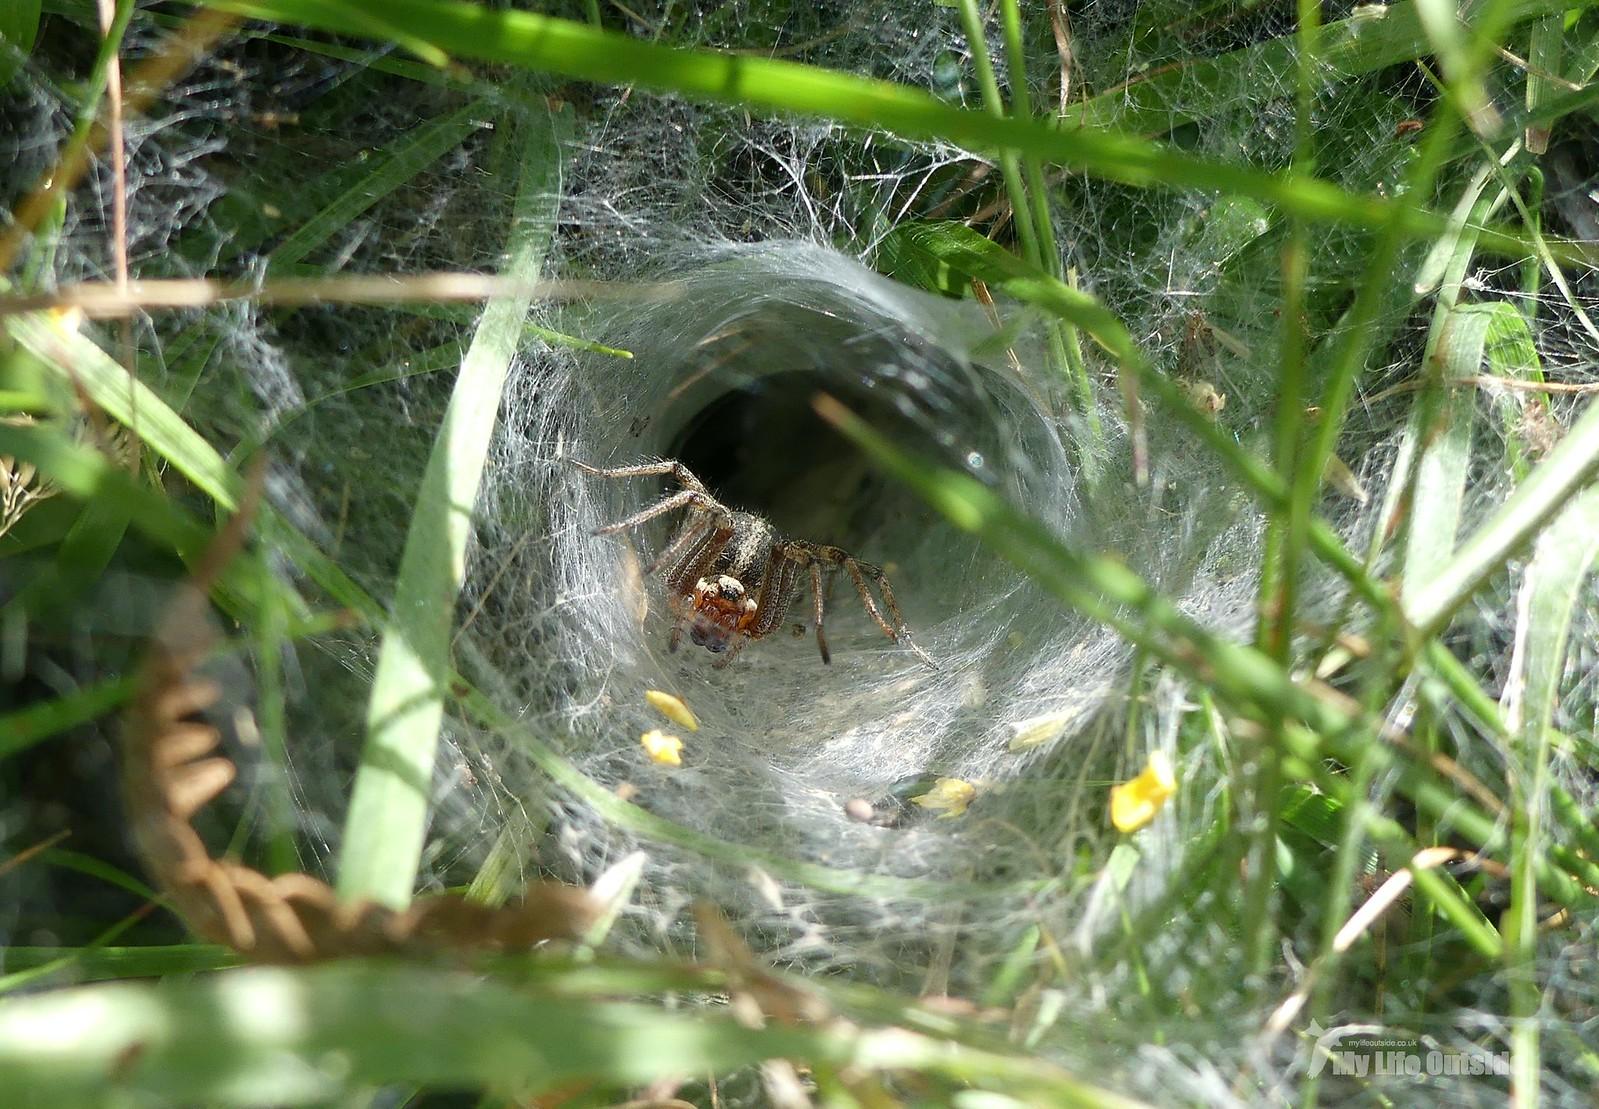 P1240268 - Labyrinth Spider